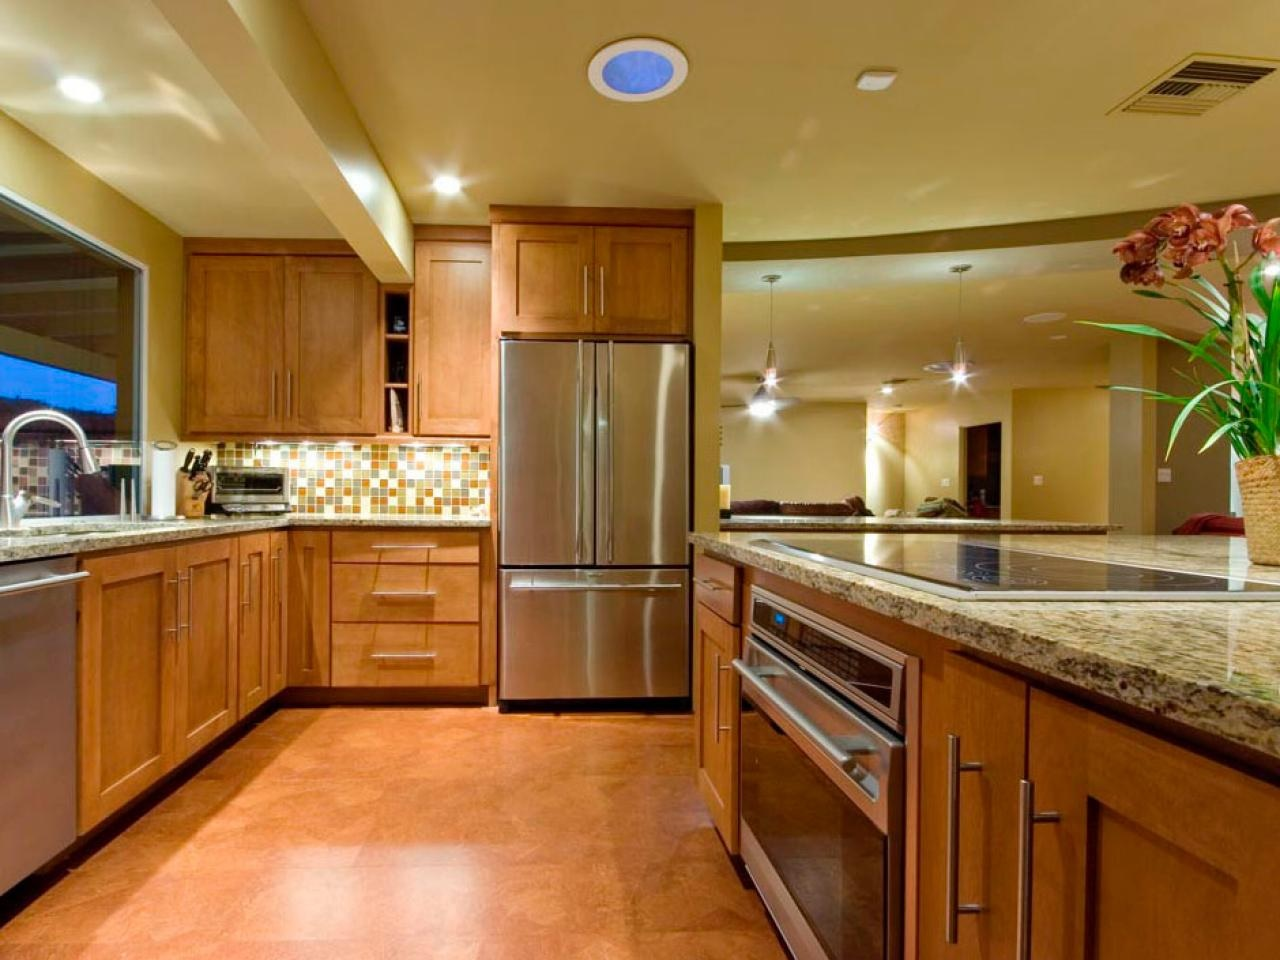 orange color kitchen floor image